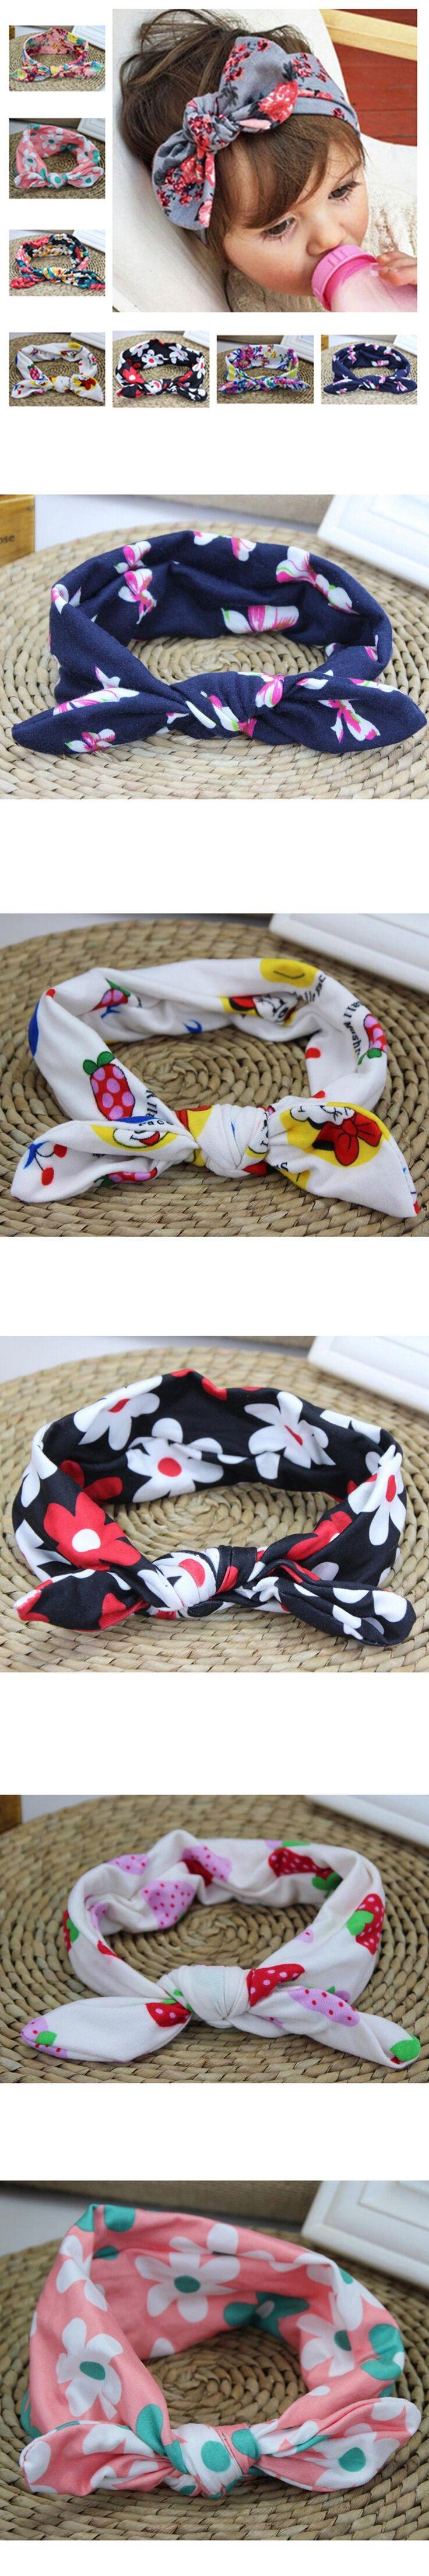 1 PC Baby Girls Toddler Infant Newborn Flowers Print Floral Bow Headband Kids Turban Top Knot Baby Headband Hair Accessories